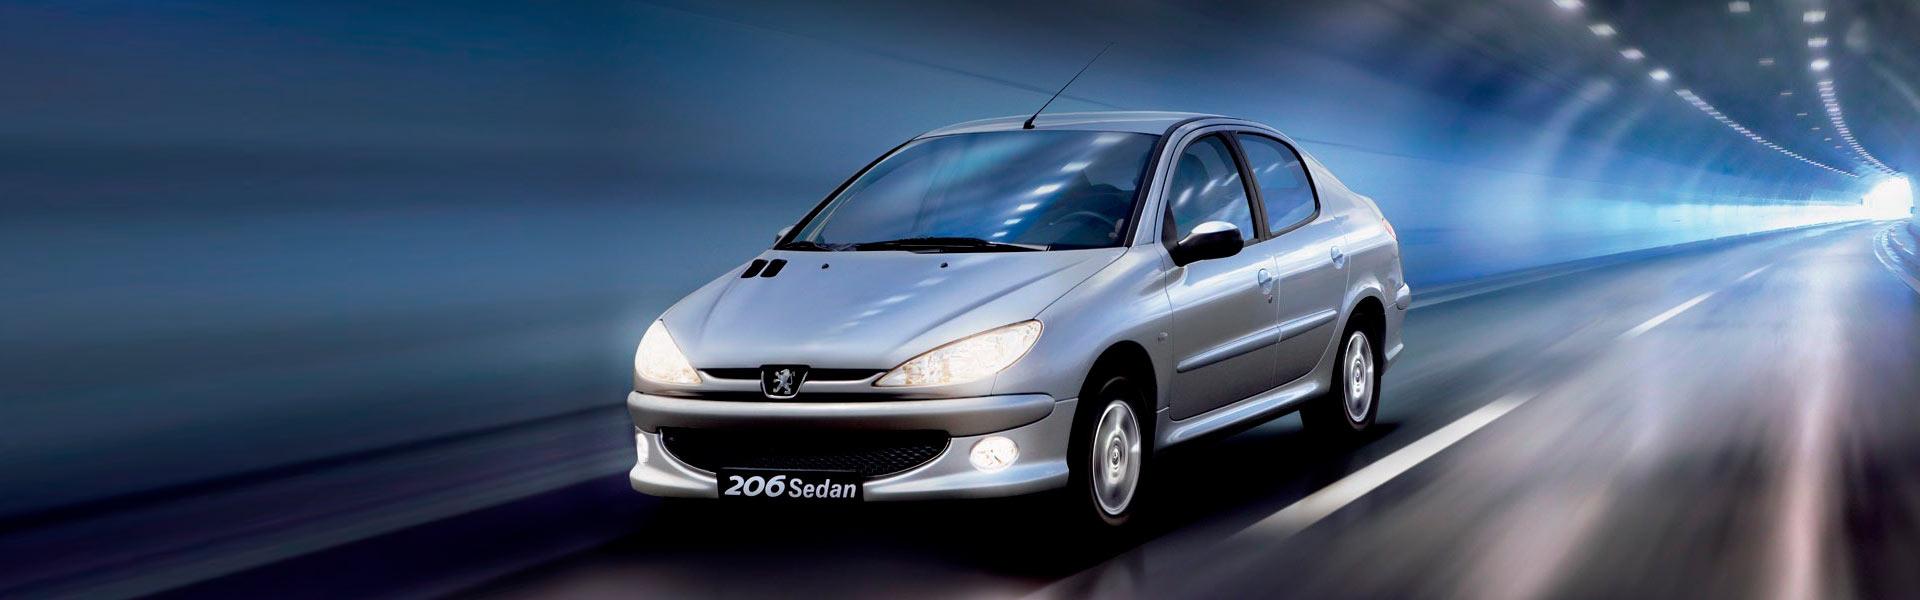 Шаровая опора на Peugeot 206